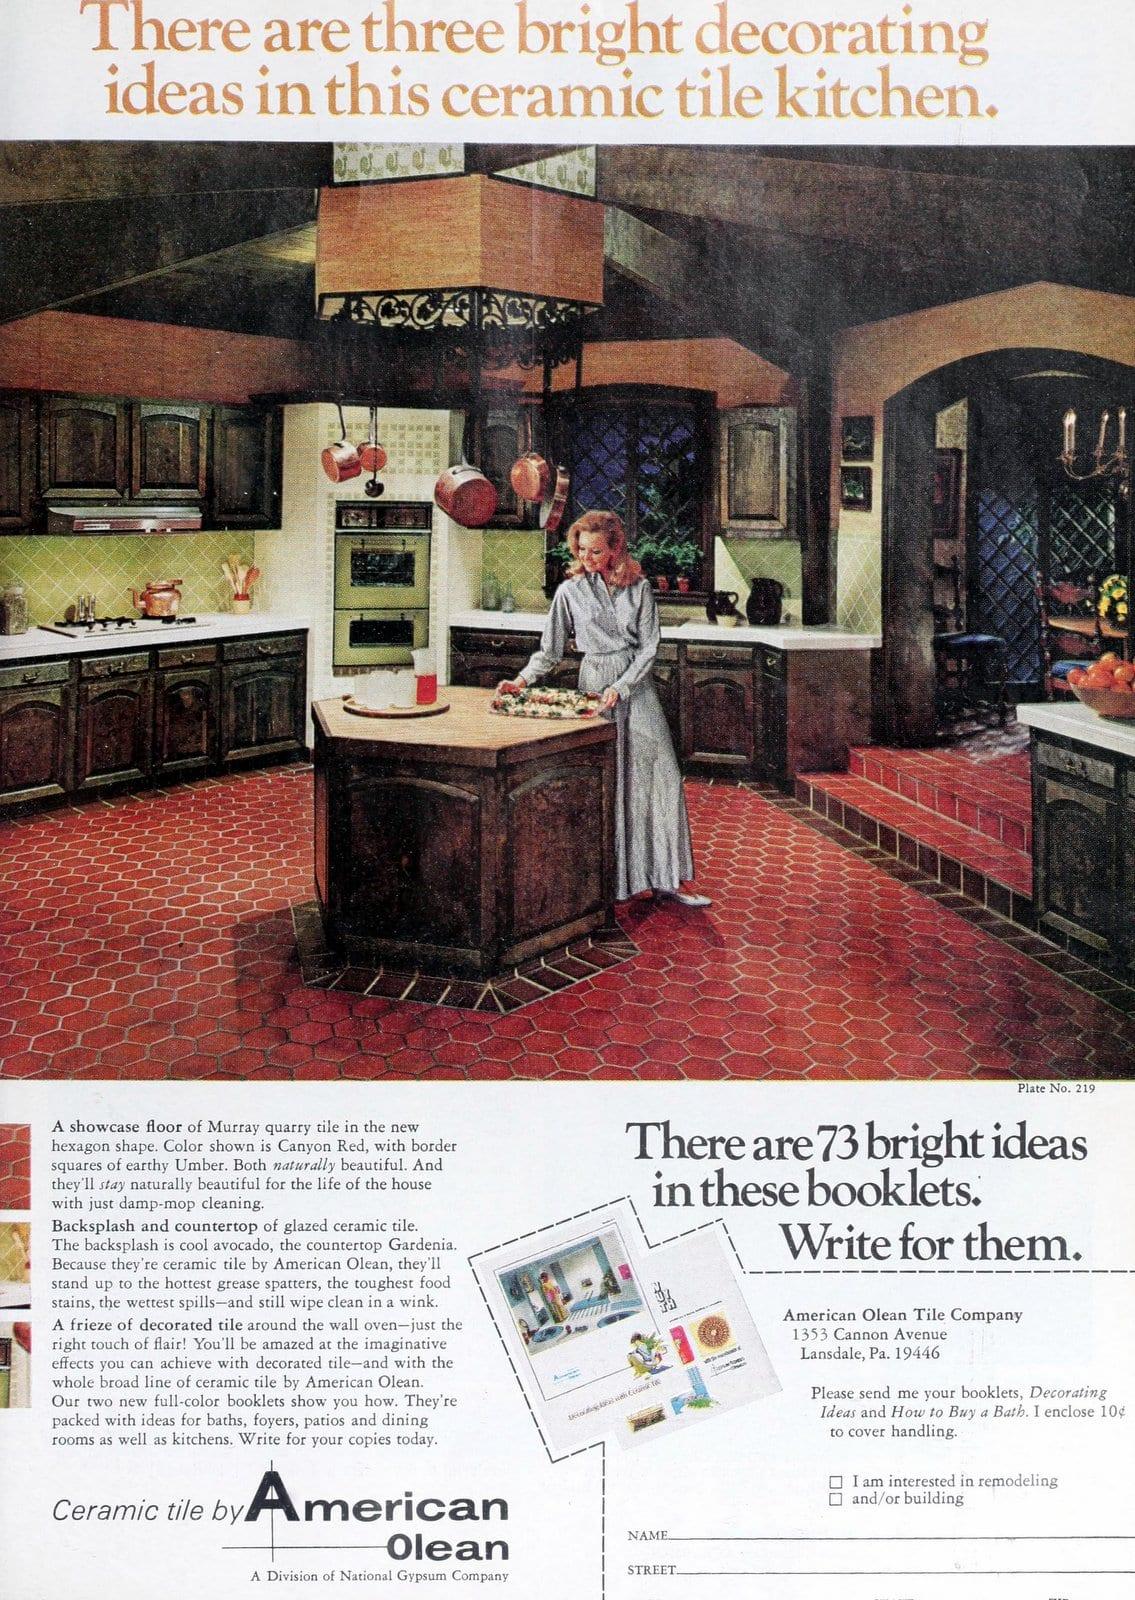 Retro sixties ceramic tile kitchen decor (1969)